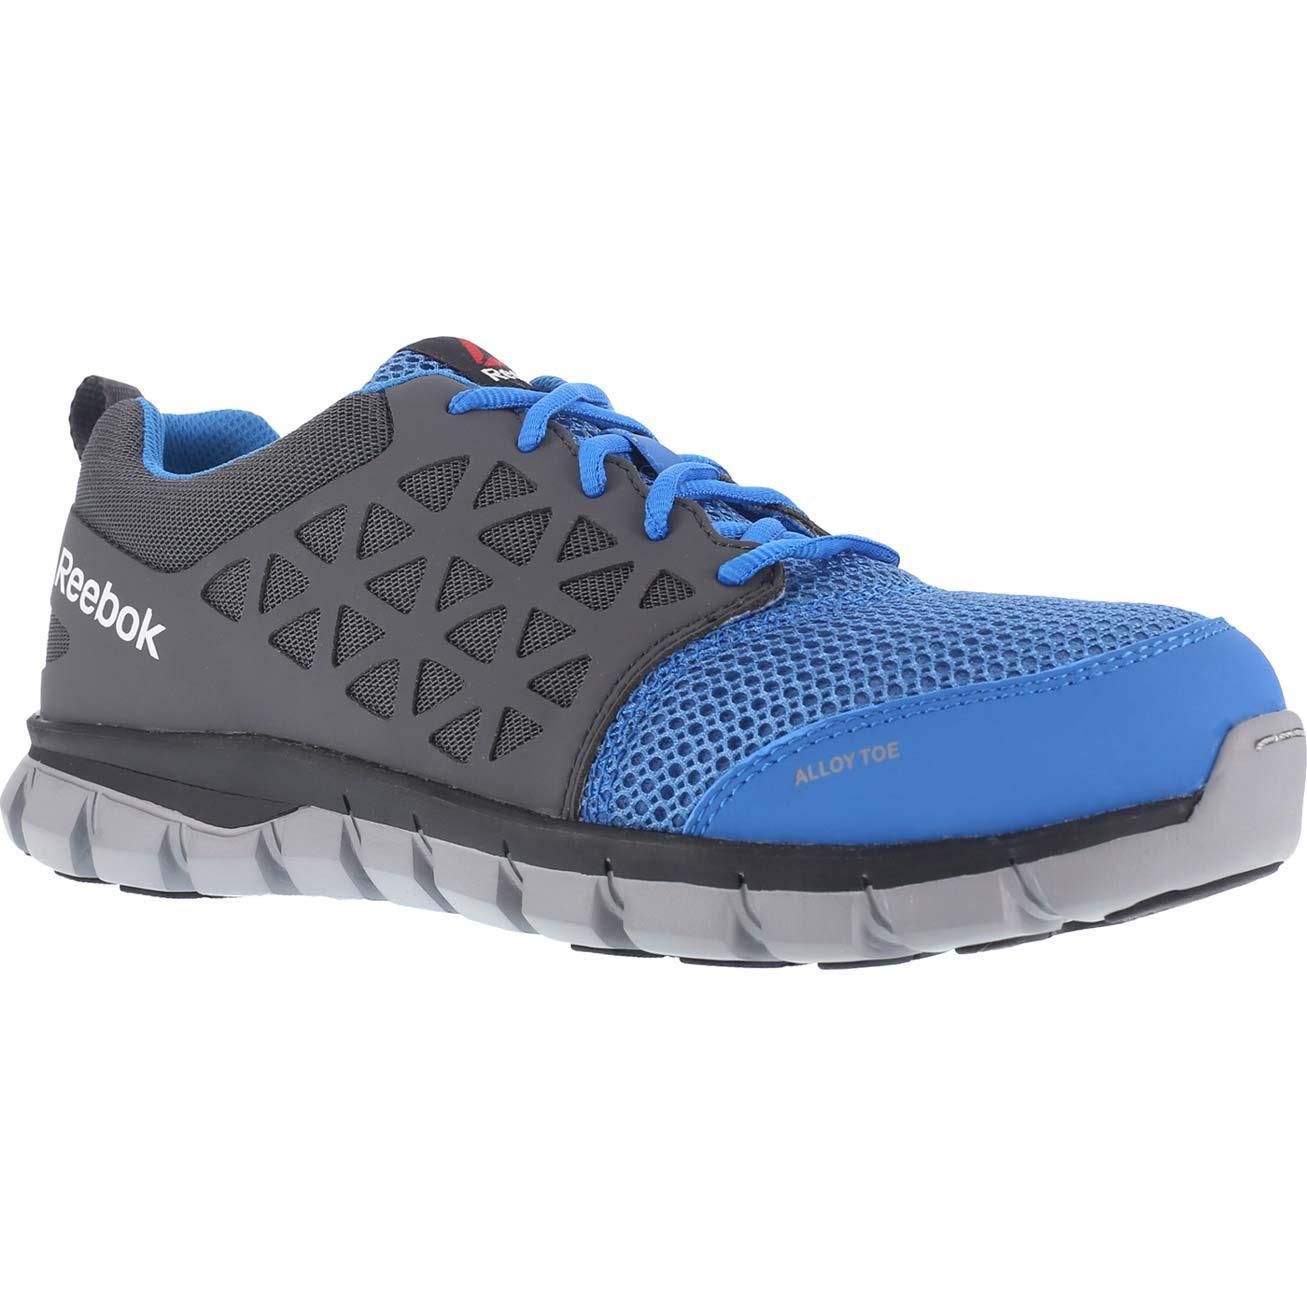 Reebok Sublite Cushion Work Alloy Toe Static Dissipative Work Athletic Shoe